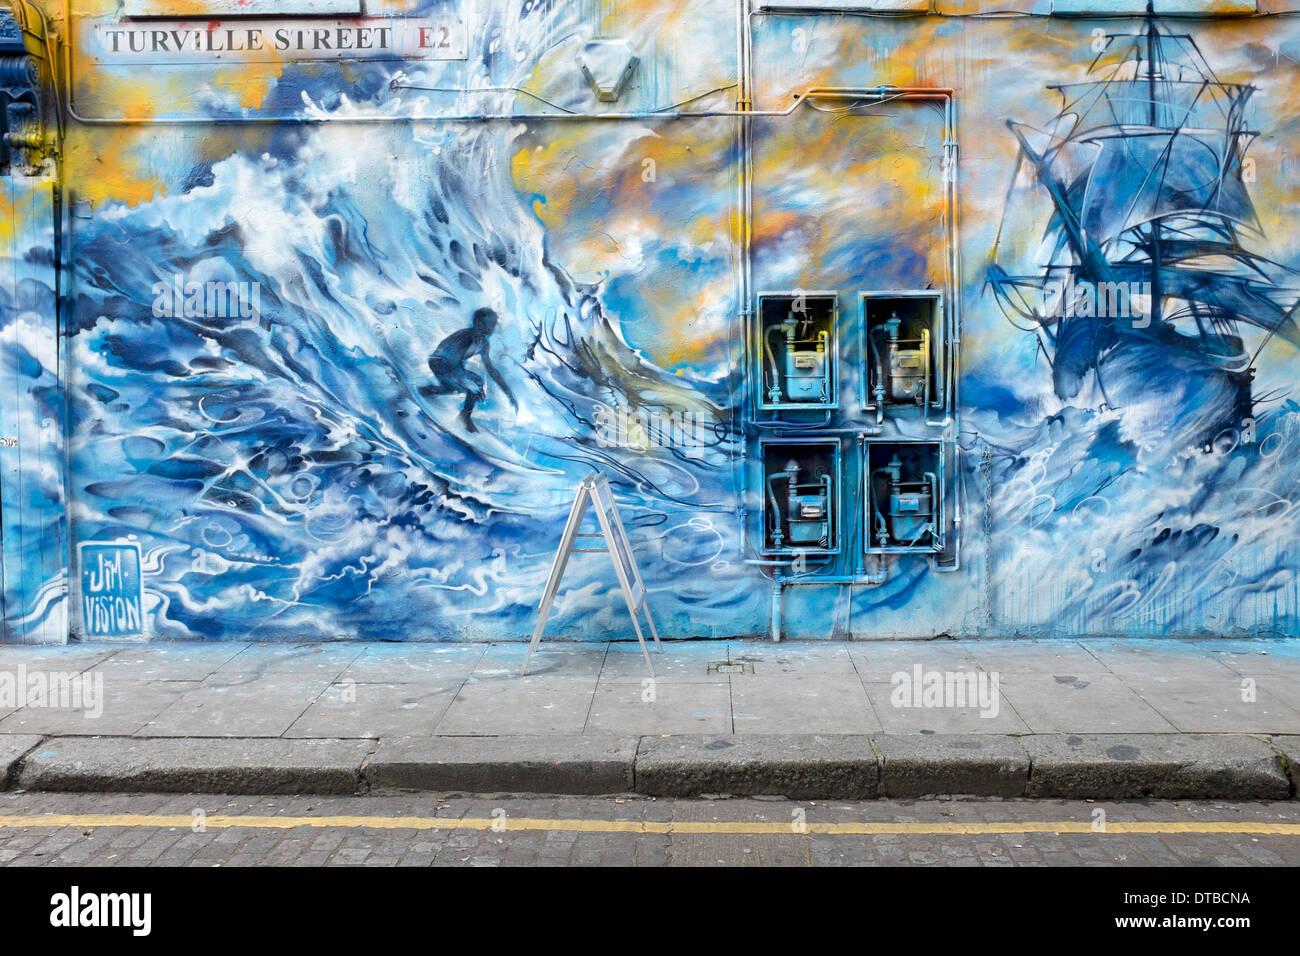 wall mural turville street e2 london stock photo royalty free stock photo wall mural turville street e2 london